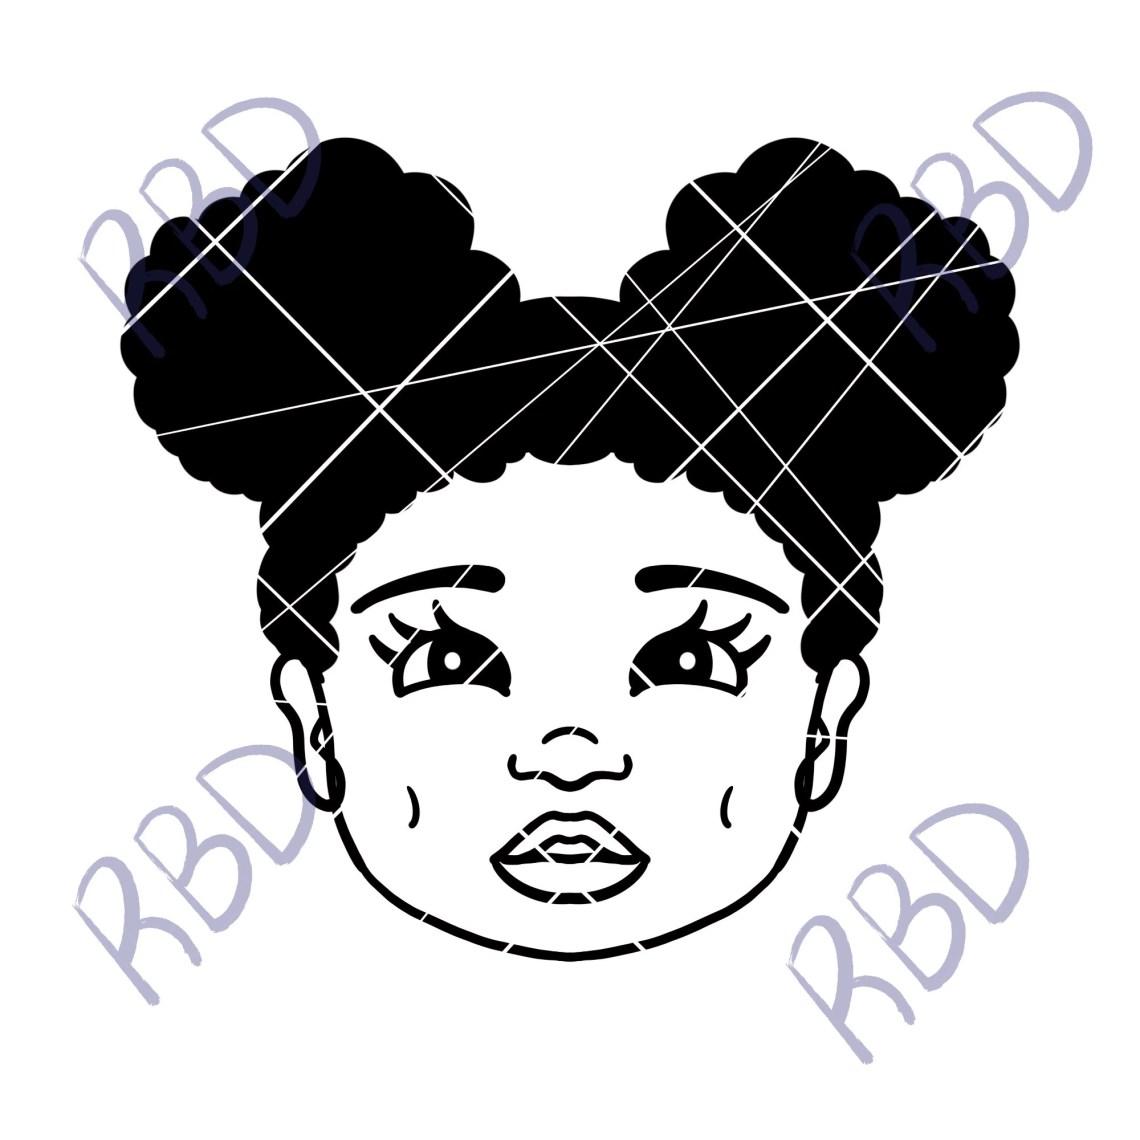 Download 2 PUFFS BABY LOVE Pink Bundle 6, svg png pdf jpg, digital